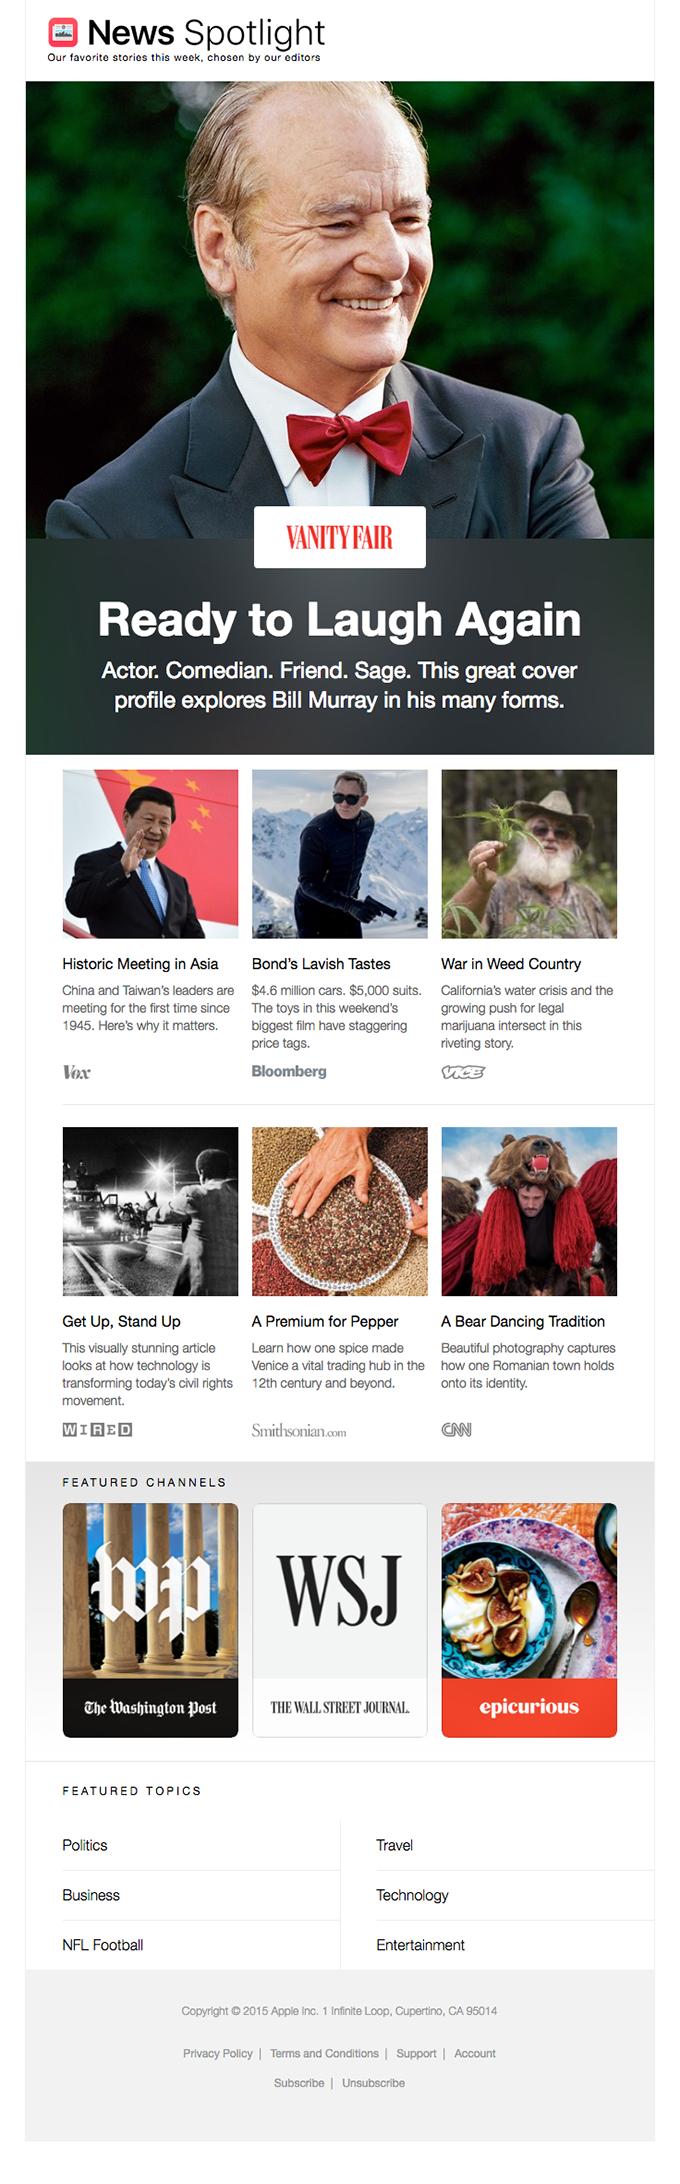 Stories on Bill Murray, Asian Politics and Bear Dancing